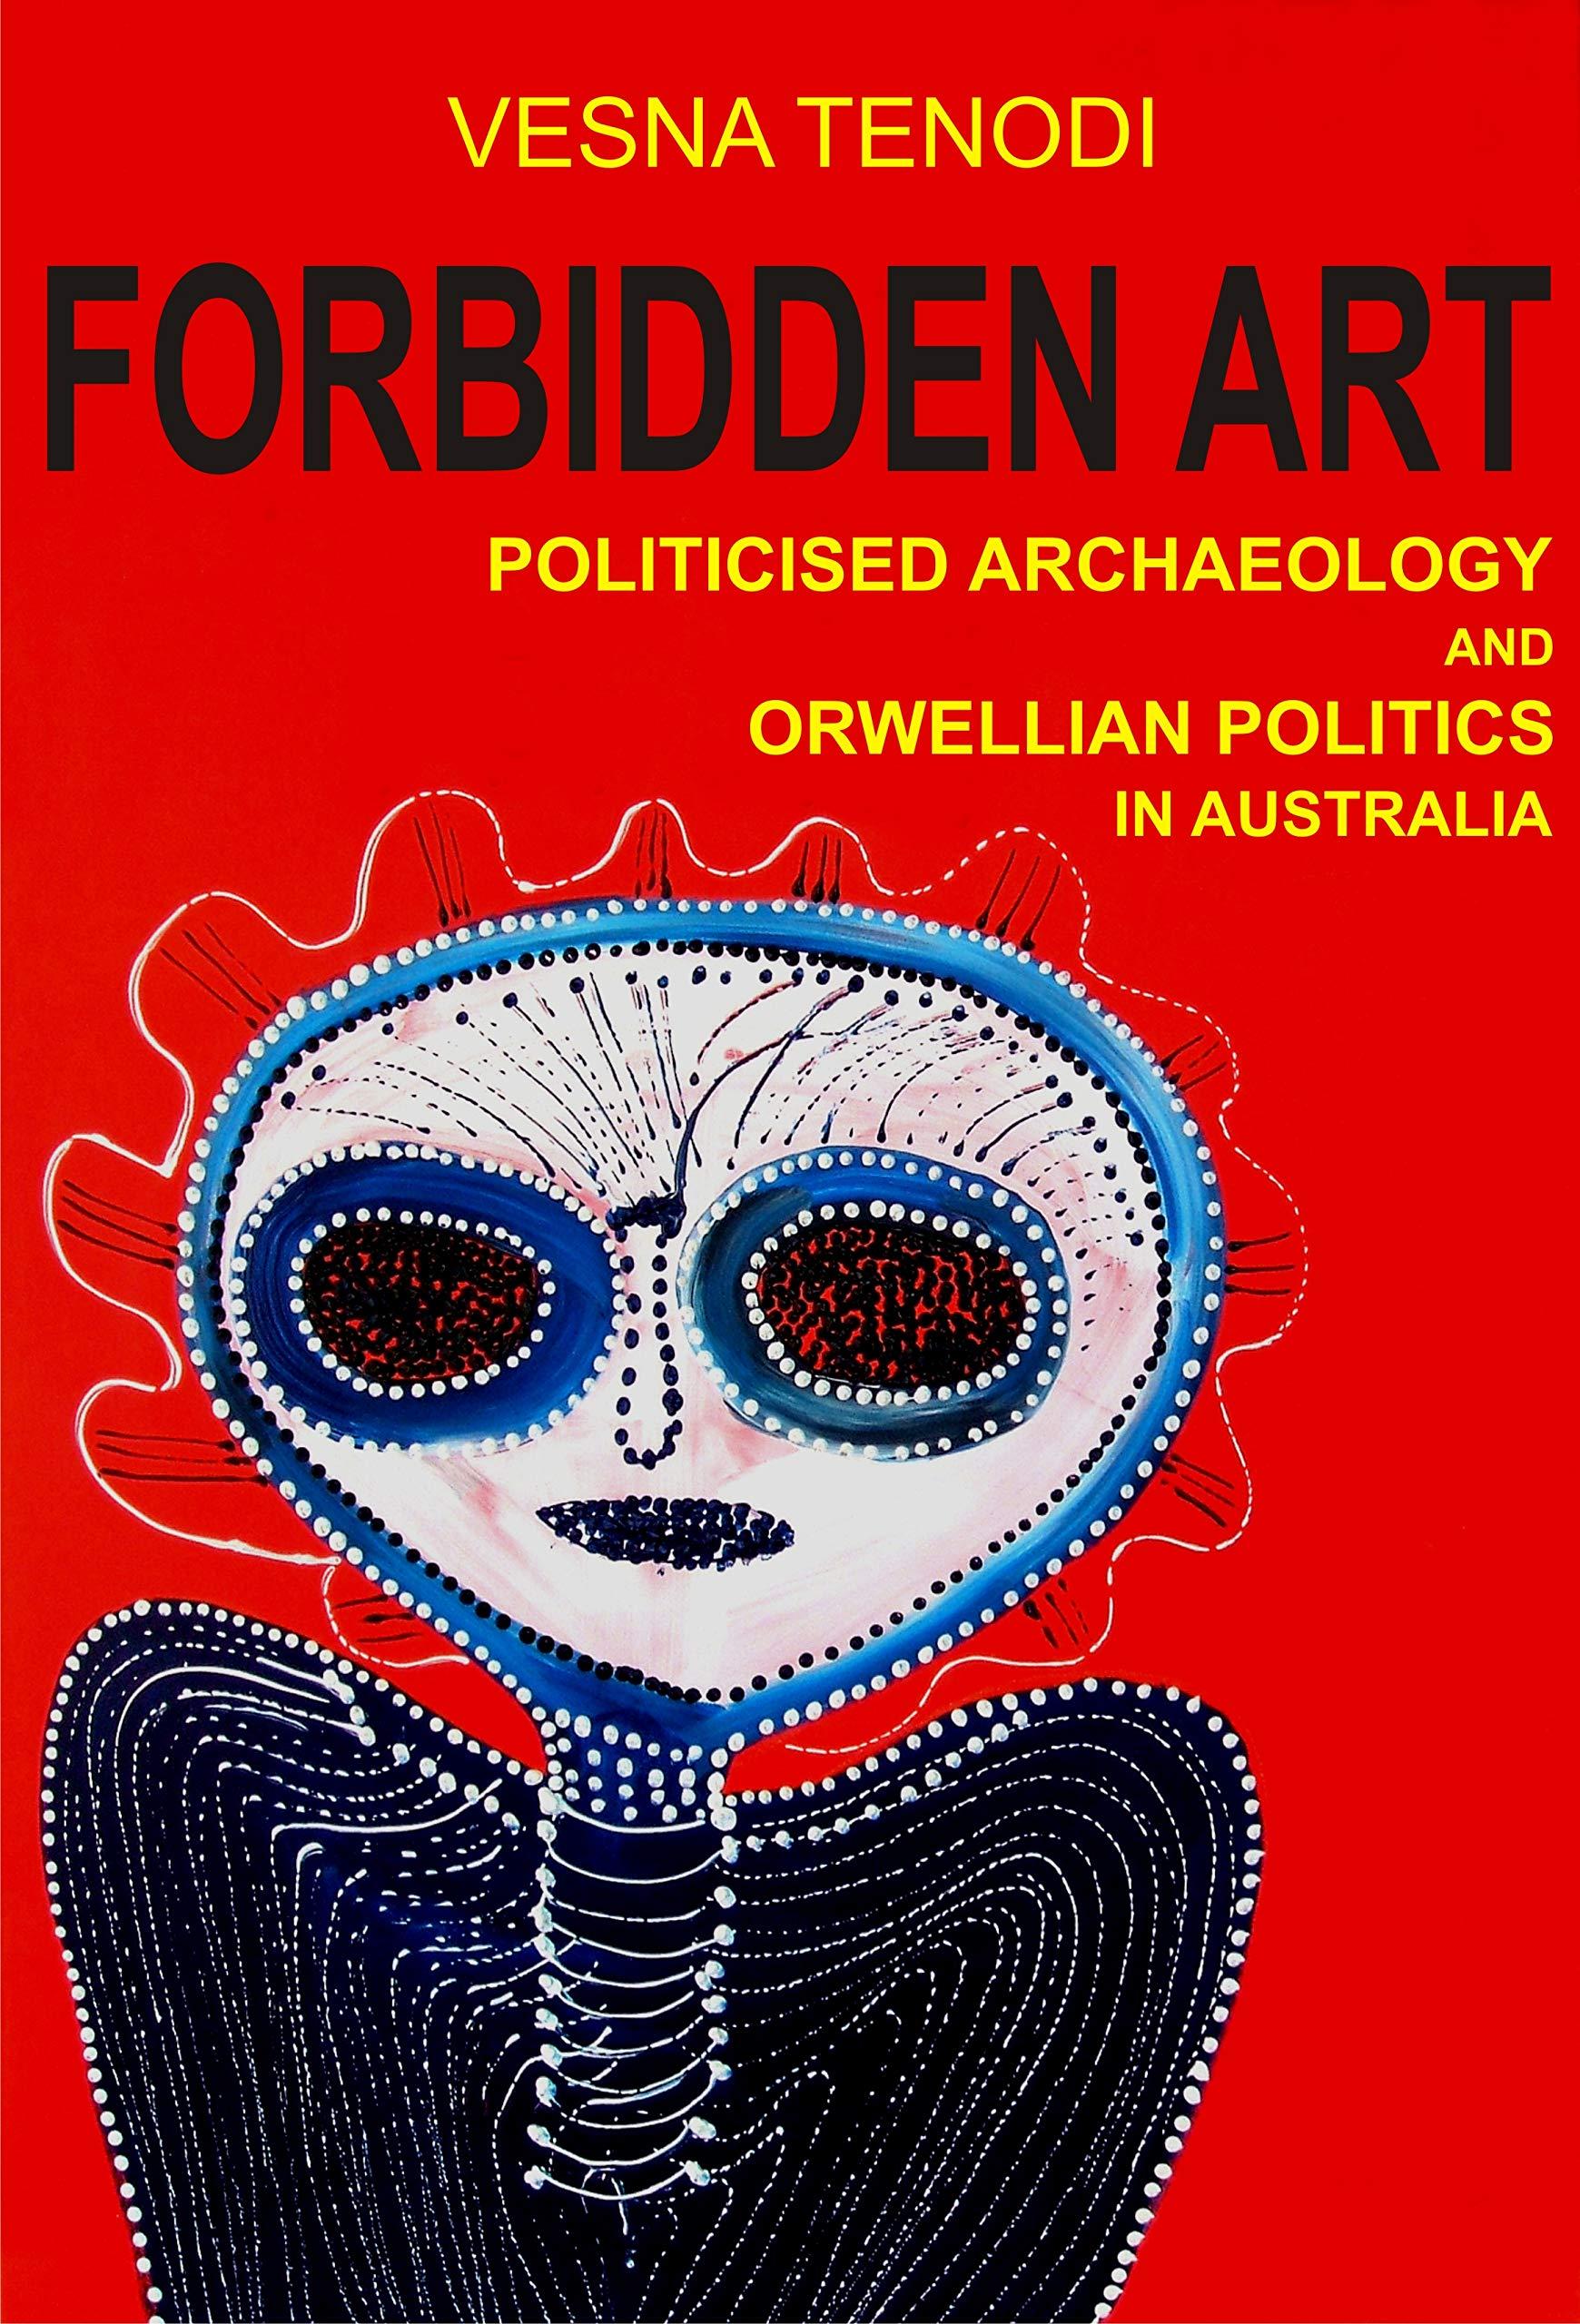 Forbidden Art: Politicised Archaeology and Orwellian Politics in Australia